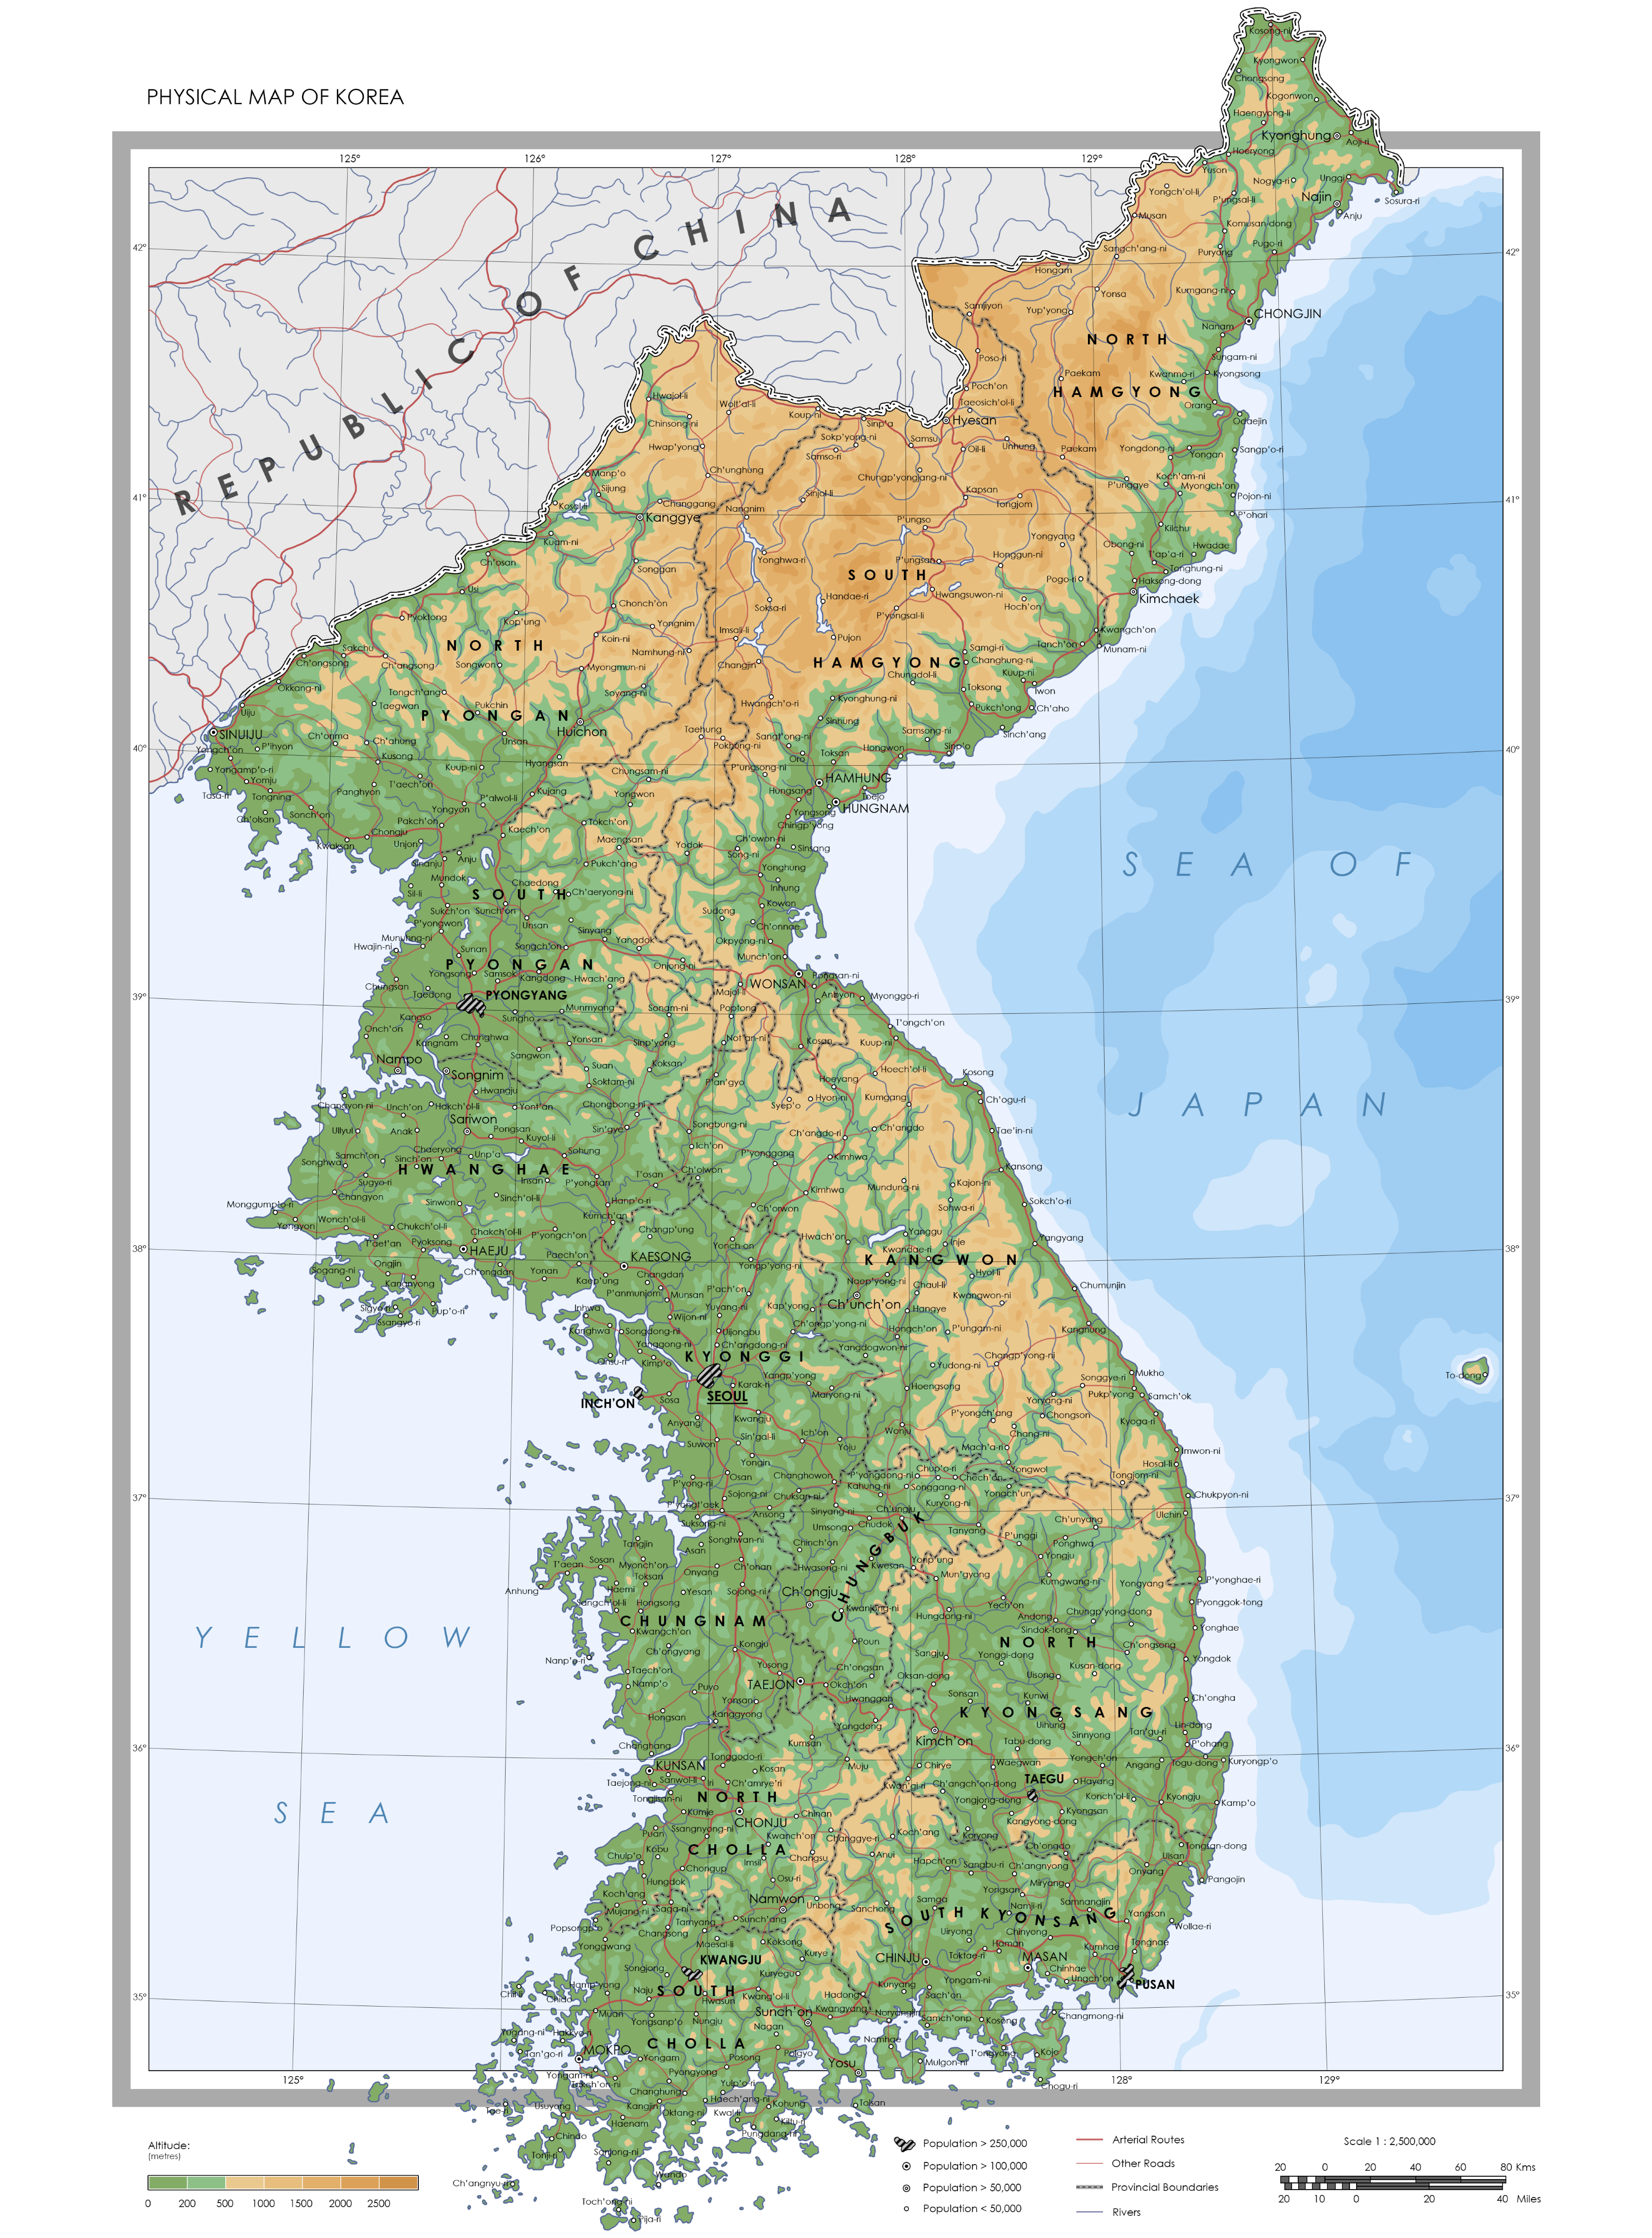 koreaTWR.png